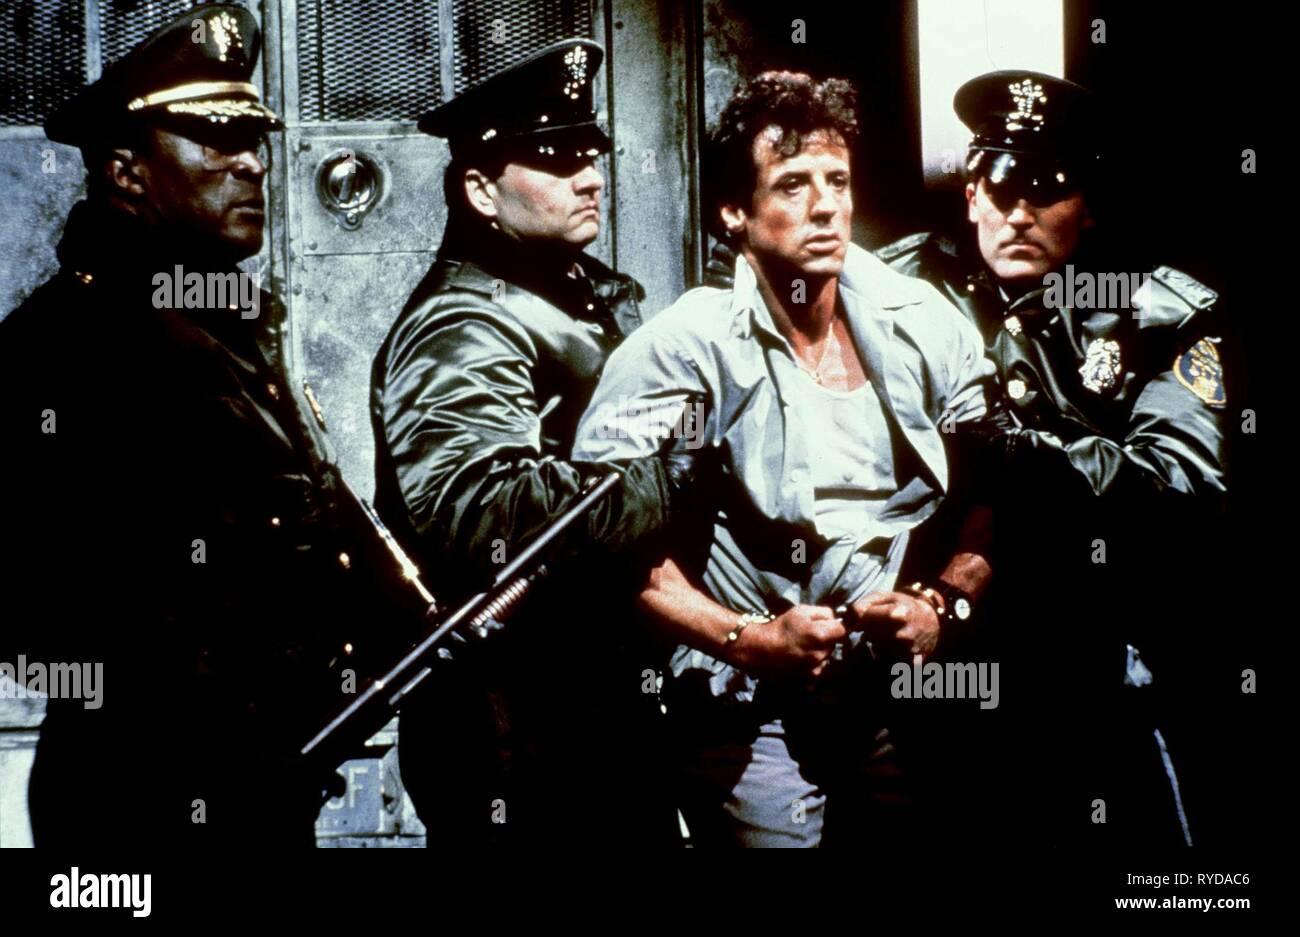 JOHN AMOS, SYLVESTER STALLONE, LOCK UP, 1989 - Stock Image